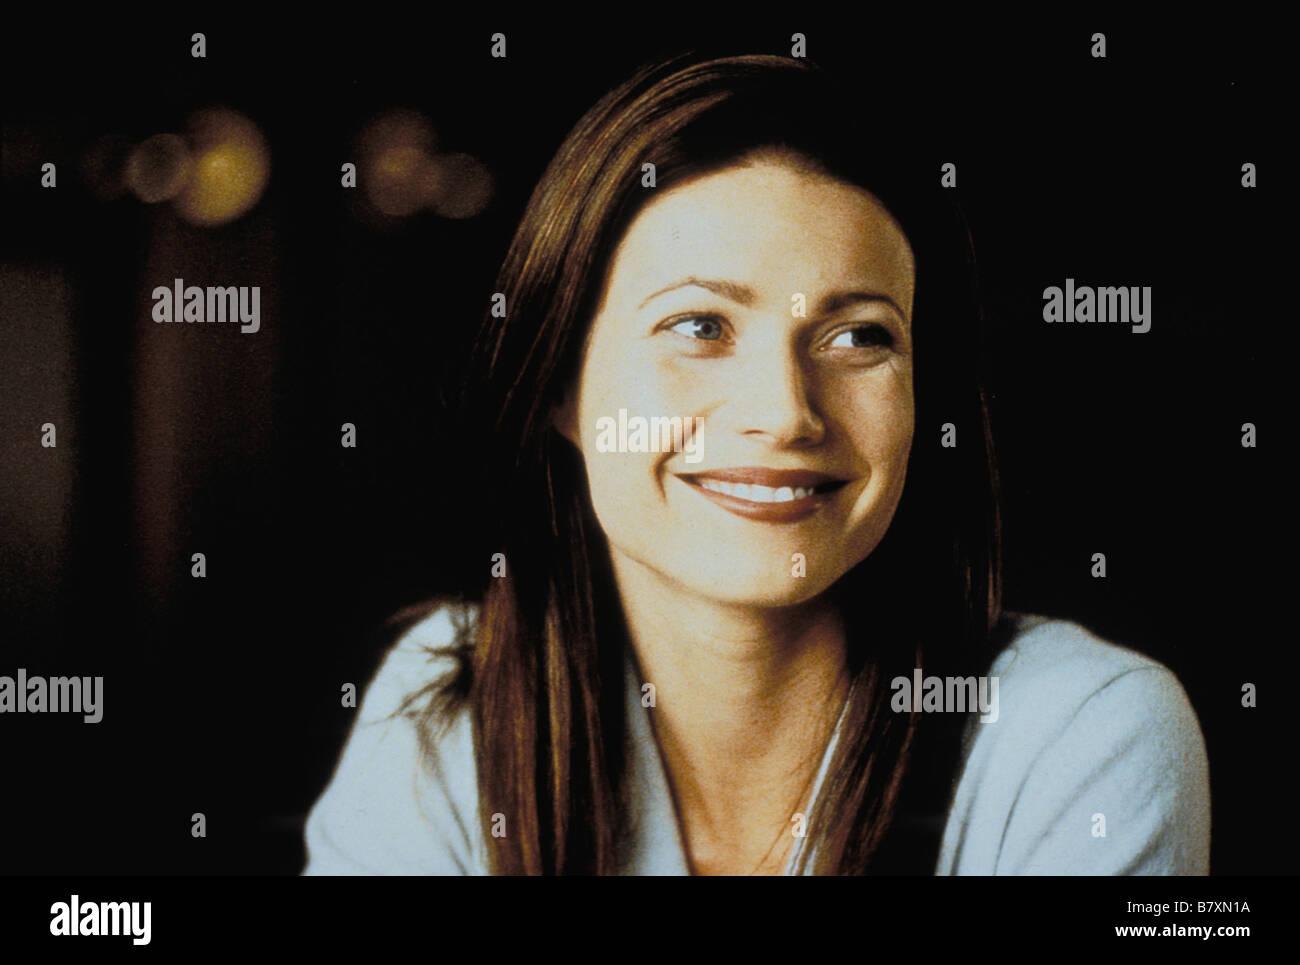 Onu amour infini Bounce Año: 2000 USA Gwyneth Paltrow Director: Don Roos Foto de stock